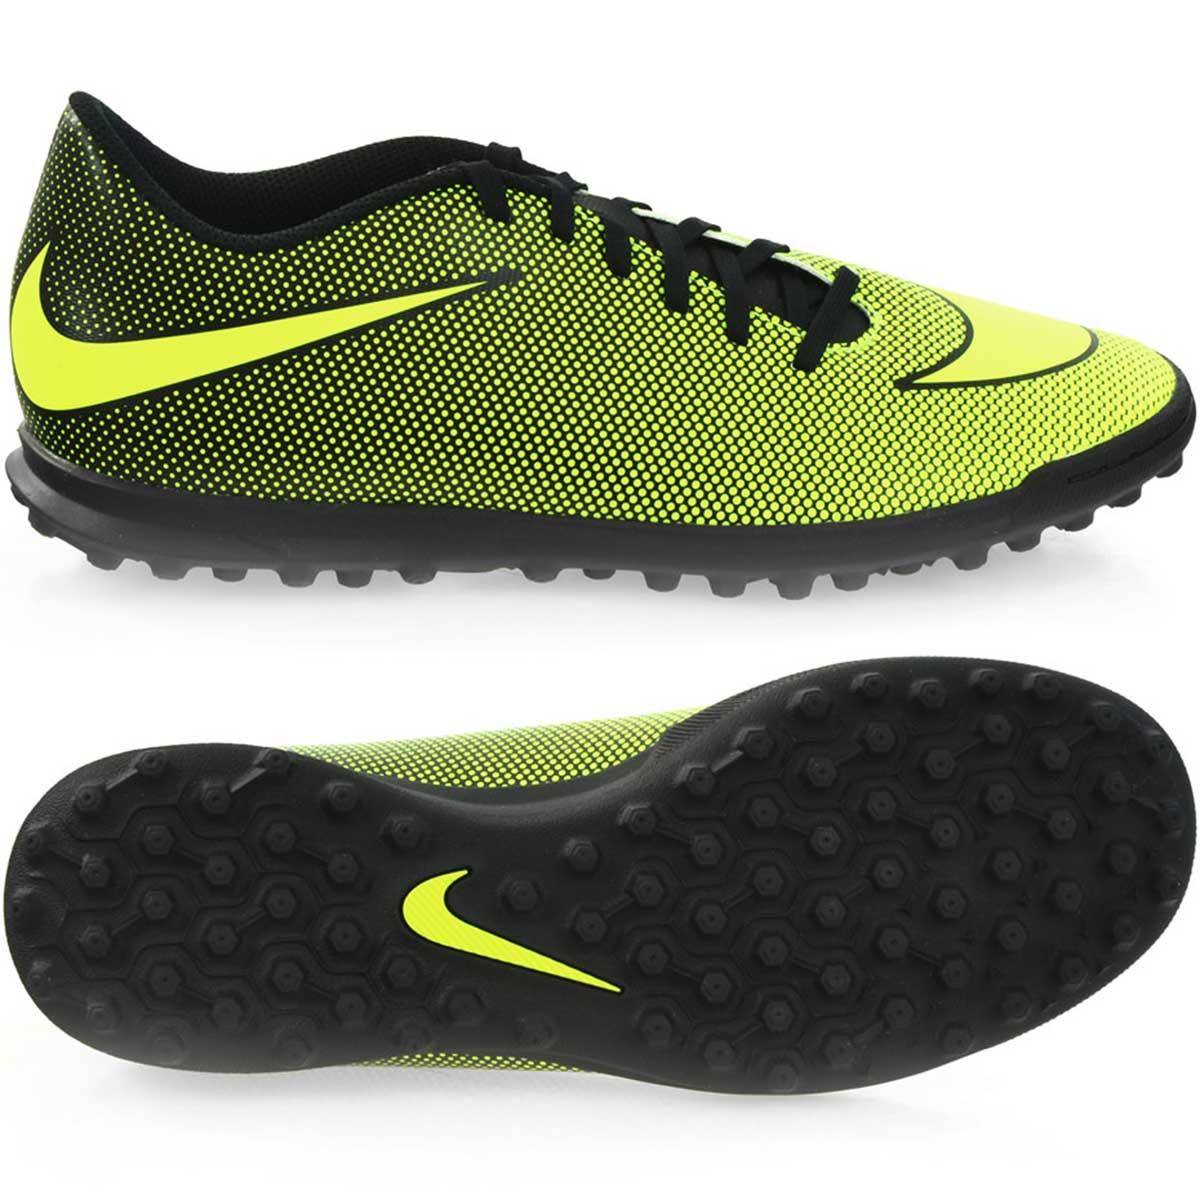 0344036514 Chuteira Nike Bravata 2 TF Society - Stigli